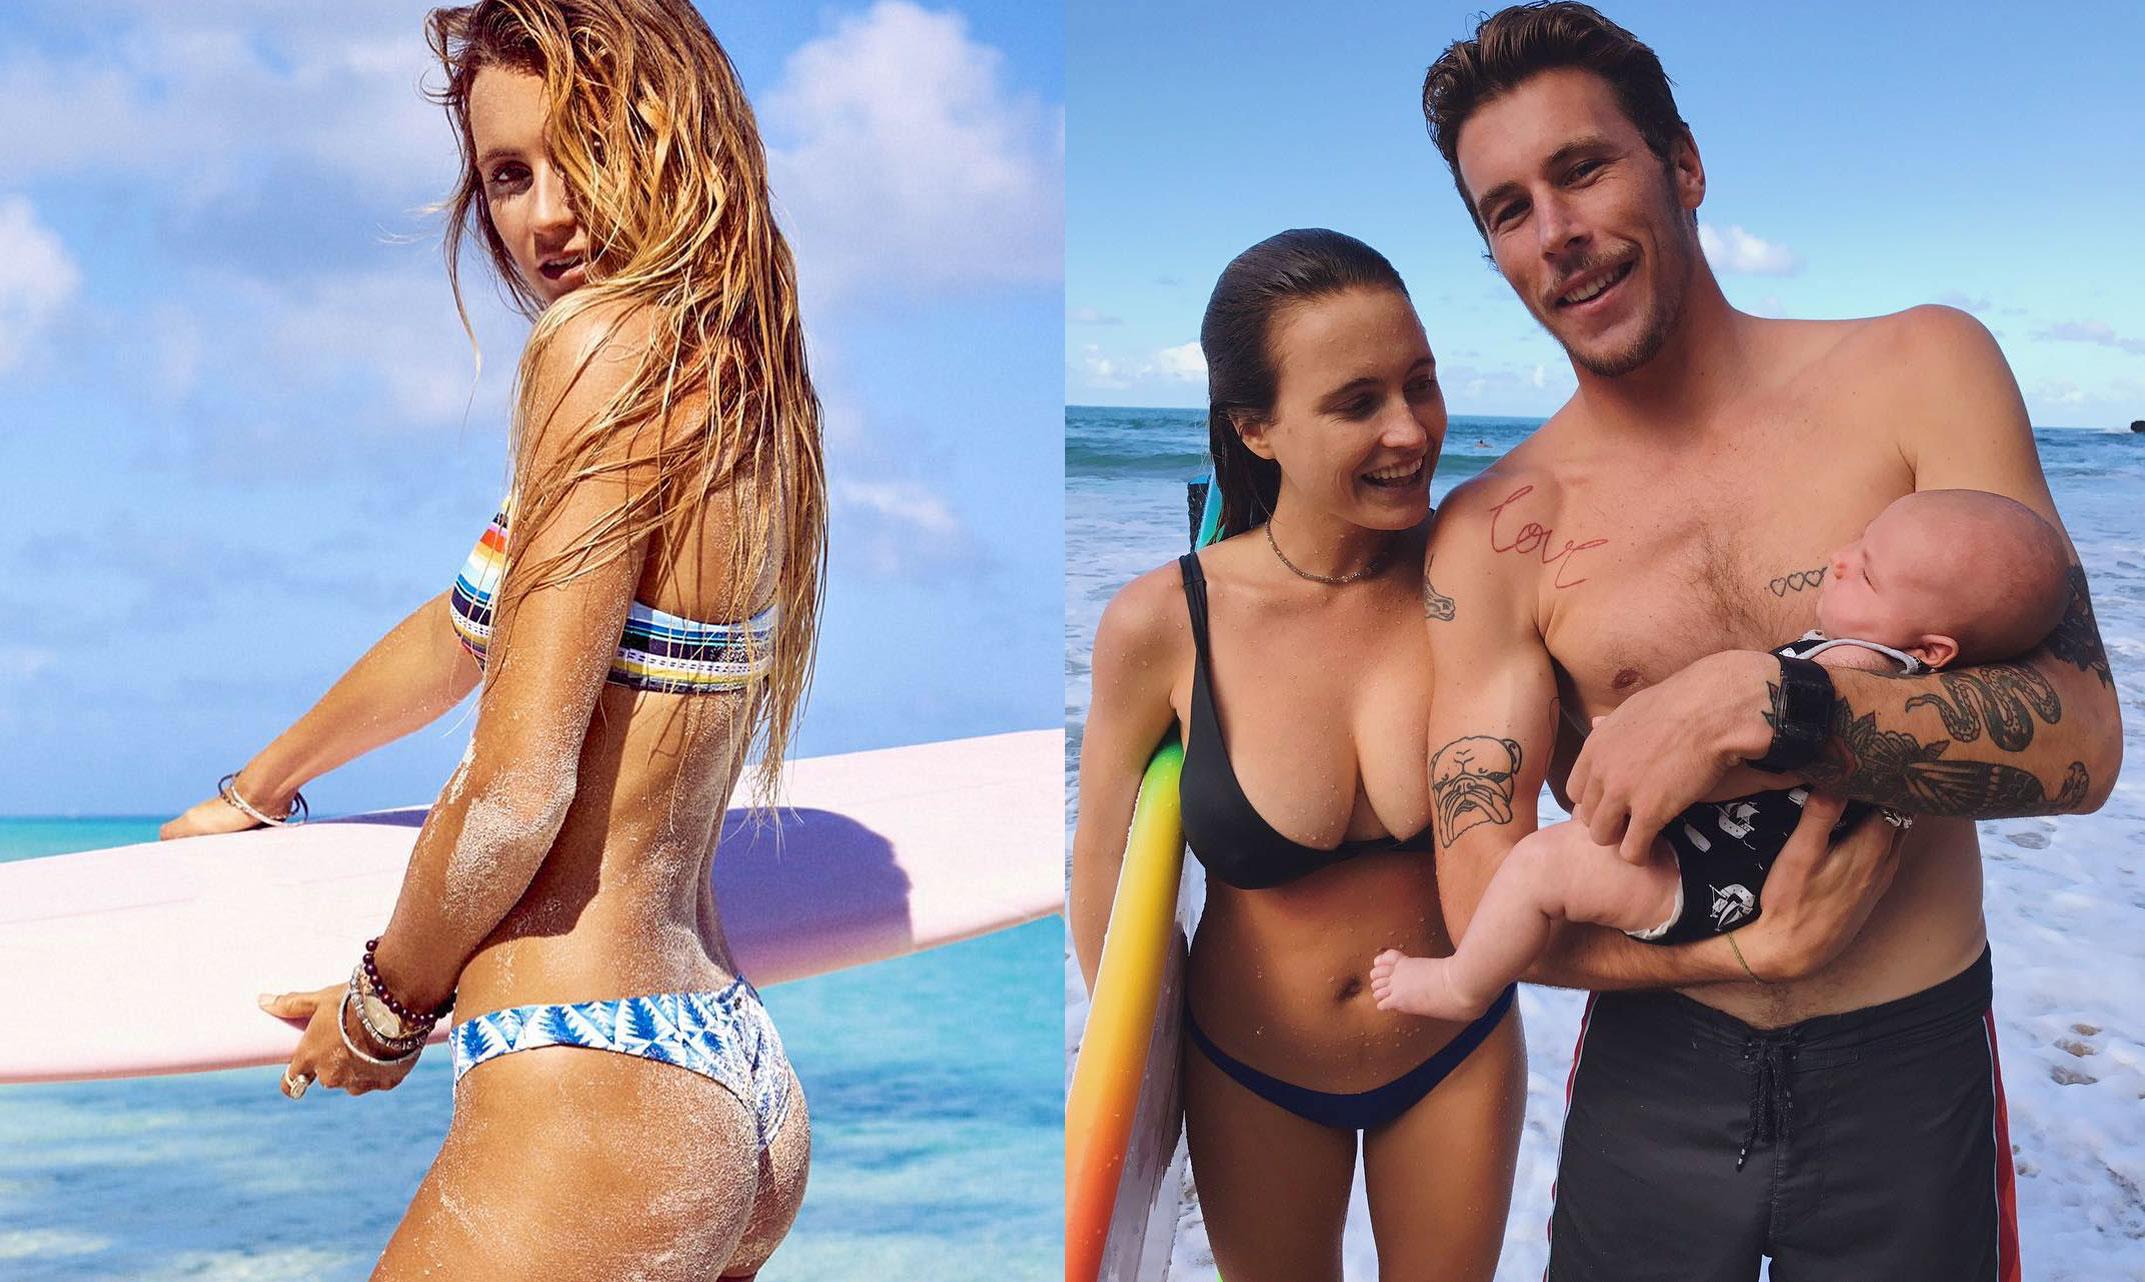 Pictures Alana Blanchard nude (59 photo), Sexy, Bikini, Selfie, swimsuit 2019